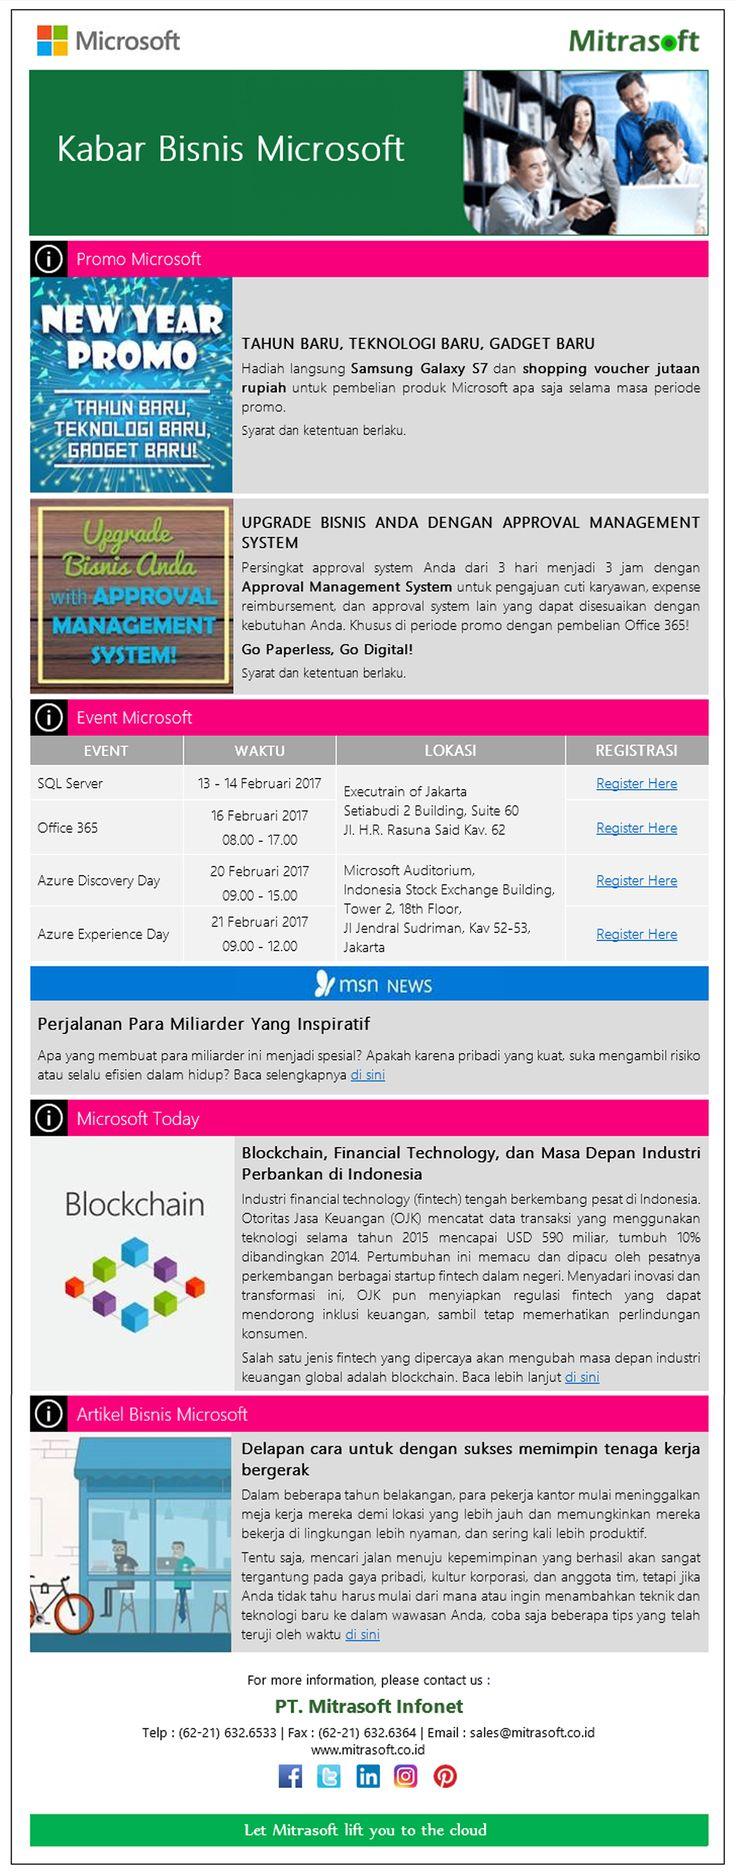 #MitrasoftNews [Promo, Event, Artikel] Kabar Bisnis #Microsoft (Januari 2017) Like us: https://www.facebook.com/pt.mitrasoft.infonet Follow us: https://twitter.com/Mitrasoft_PT https://www.linkedin.com/company/mitrasoft-infonet